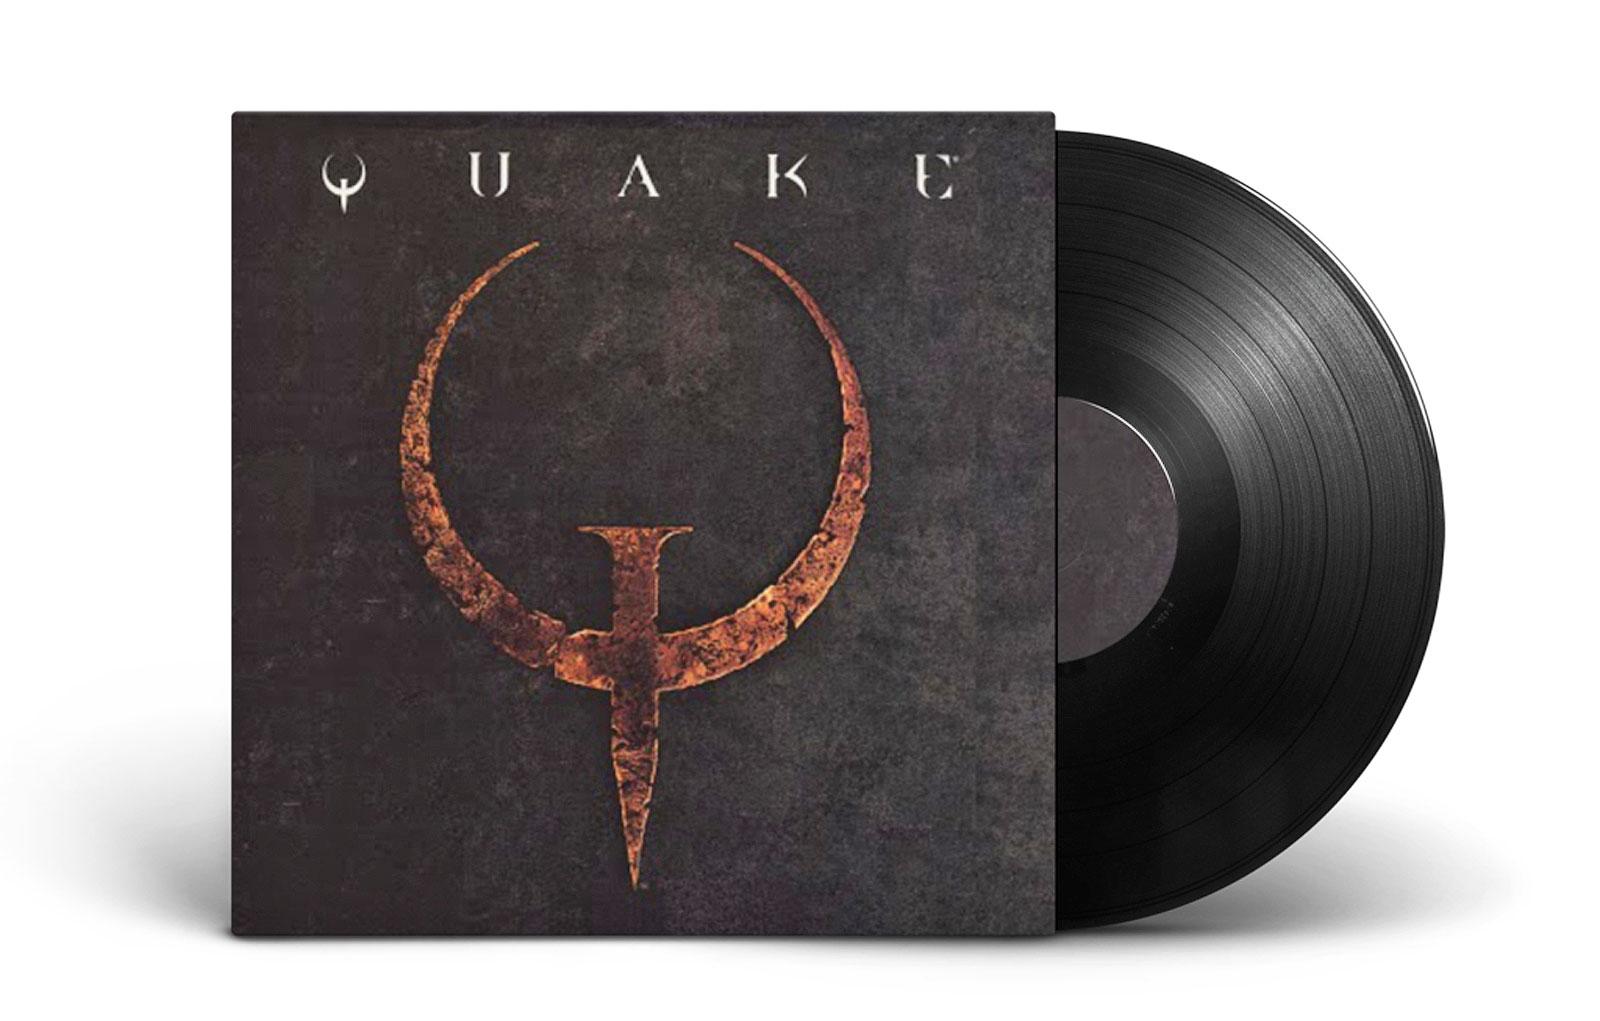 Trent Reznor blows dust off the \'Quake\' score for vinyl reissue